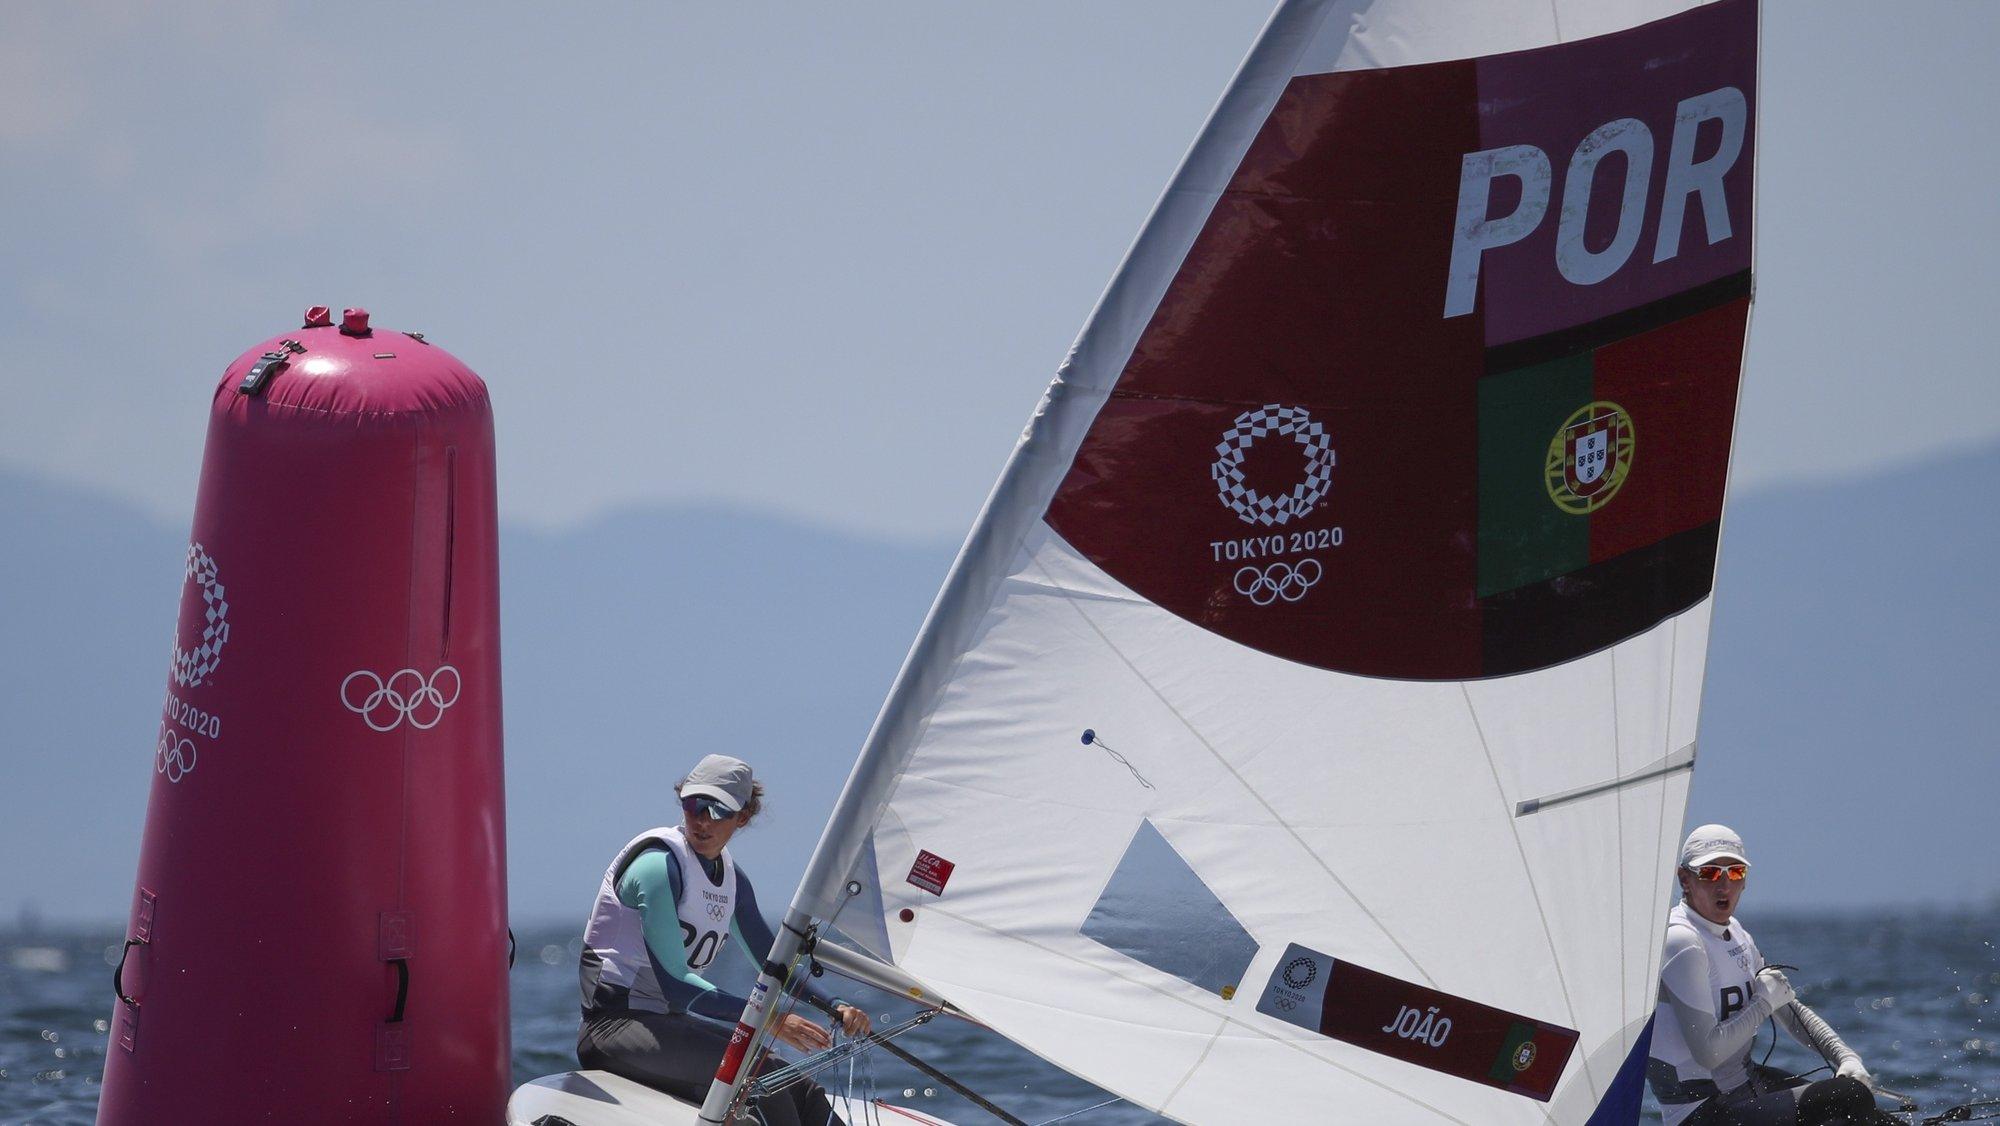 epa09361037 Laser Radial class sailor Velejadora Carolina Joao of Portugal during a training session for the Tokyo 2020 Olympic Games in Enoshima, Japan, 24 July 2021.  EPA/OLIVIER HOSLET